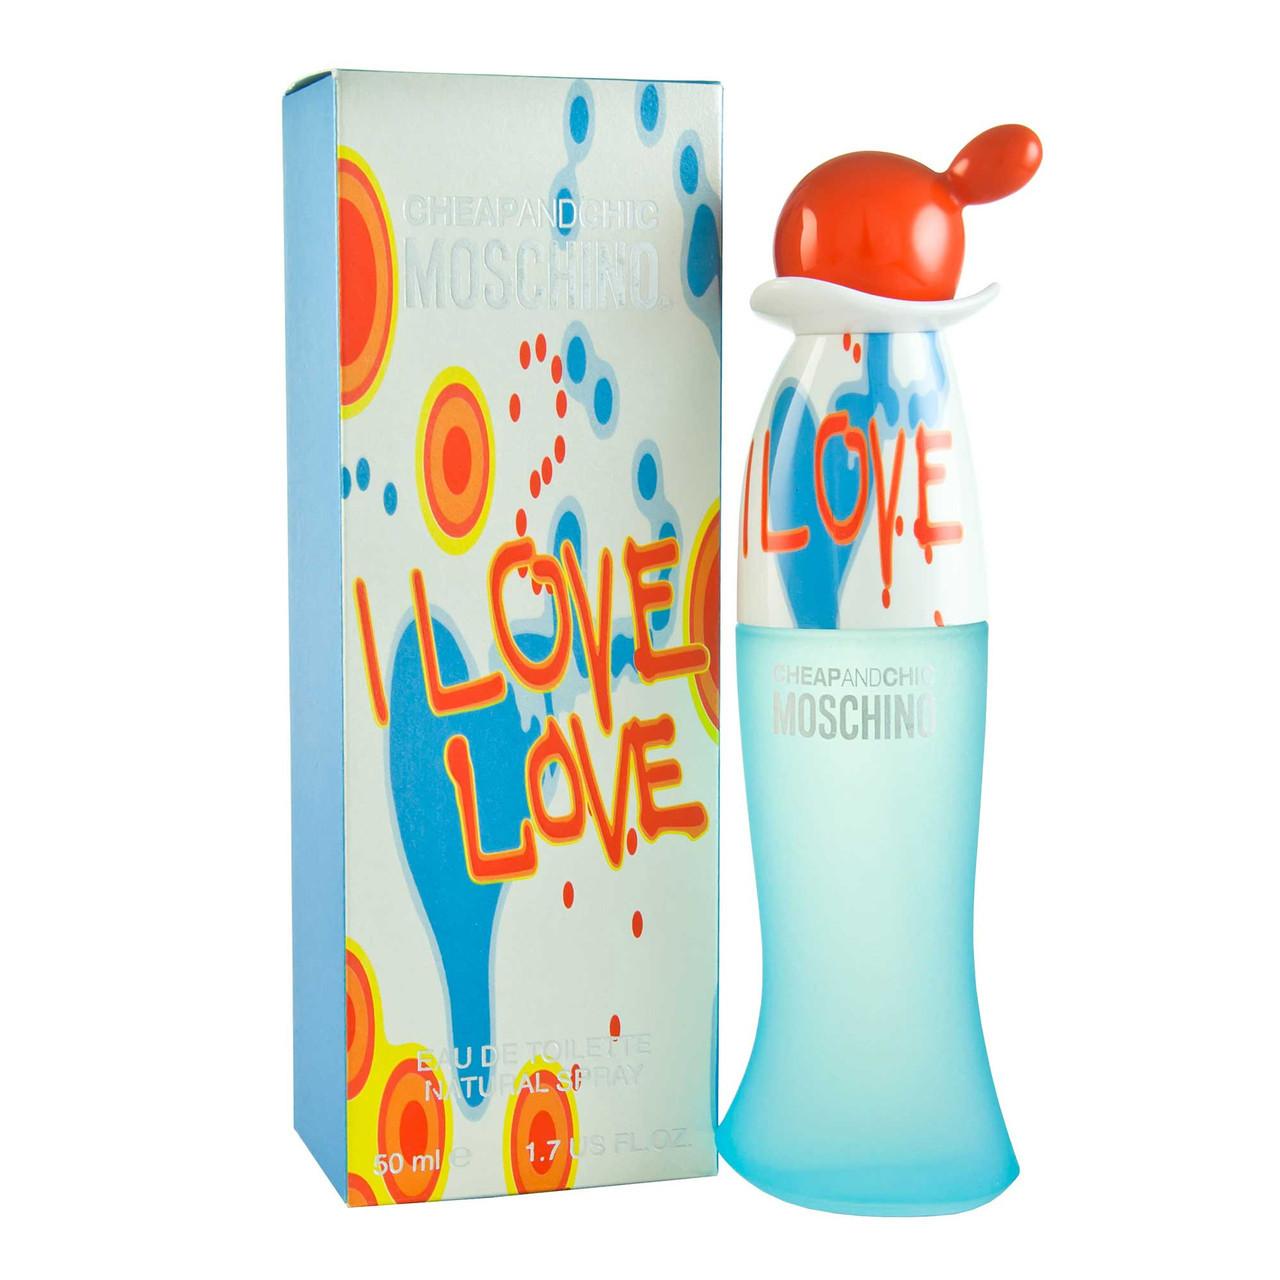 Moschino Cheap and Chic I Love Love (Москино Чип энд Чик Ай Лав Лав), женская туалетная вода , 100 ml